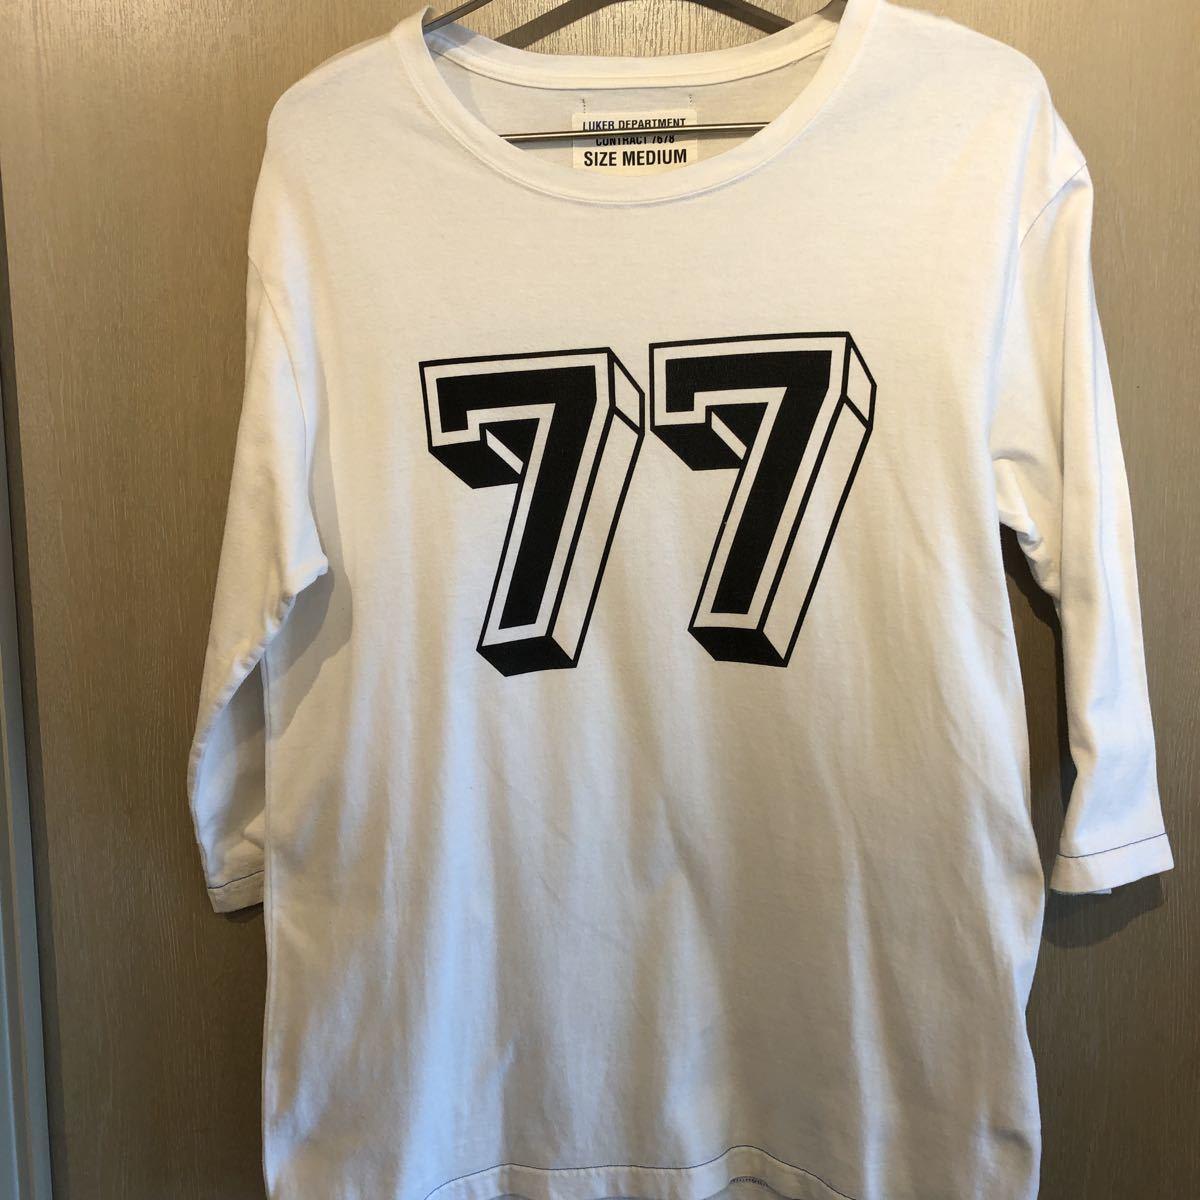 LUKER BY NEIGHBORHOOD ネイバーフッド ルーカー サイズ M 7分丈 白 Tシャツ